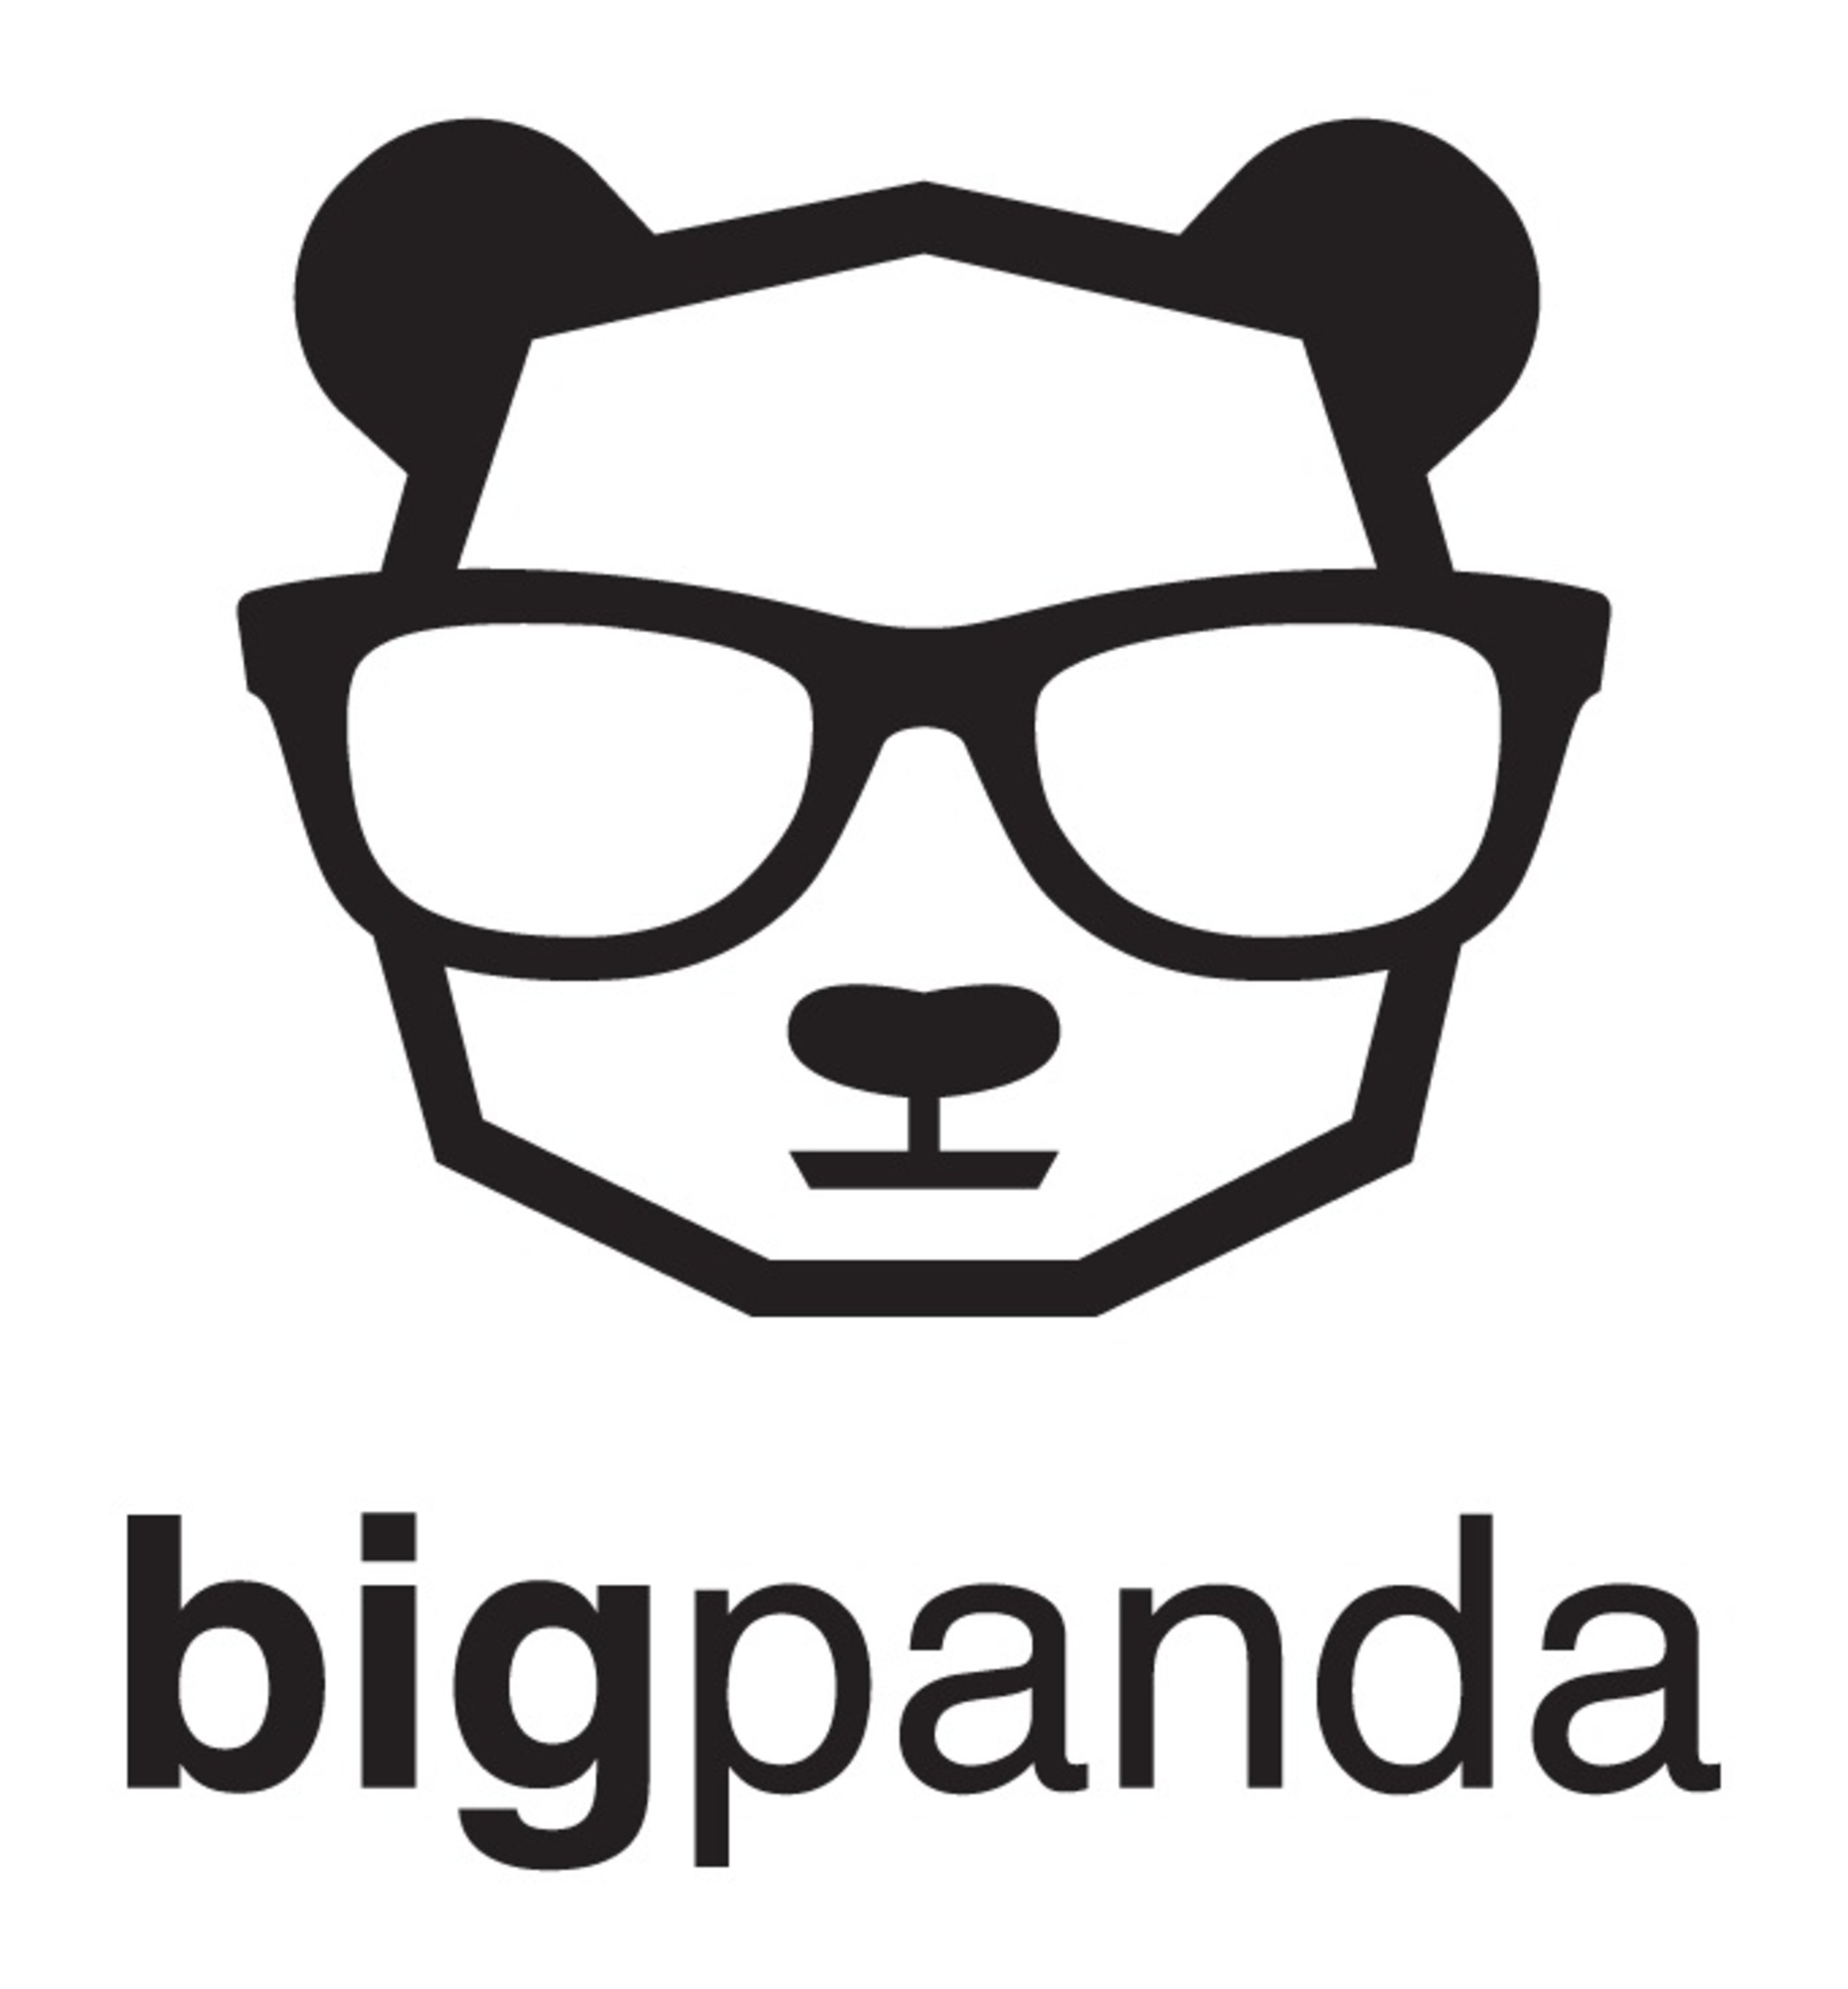 BigPanda is on the move making key executive hires.